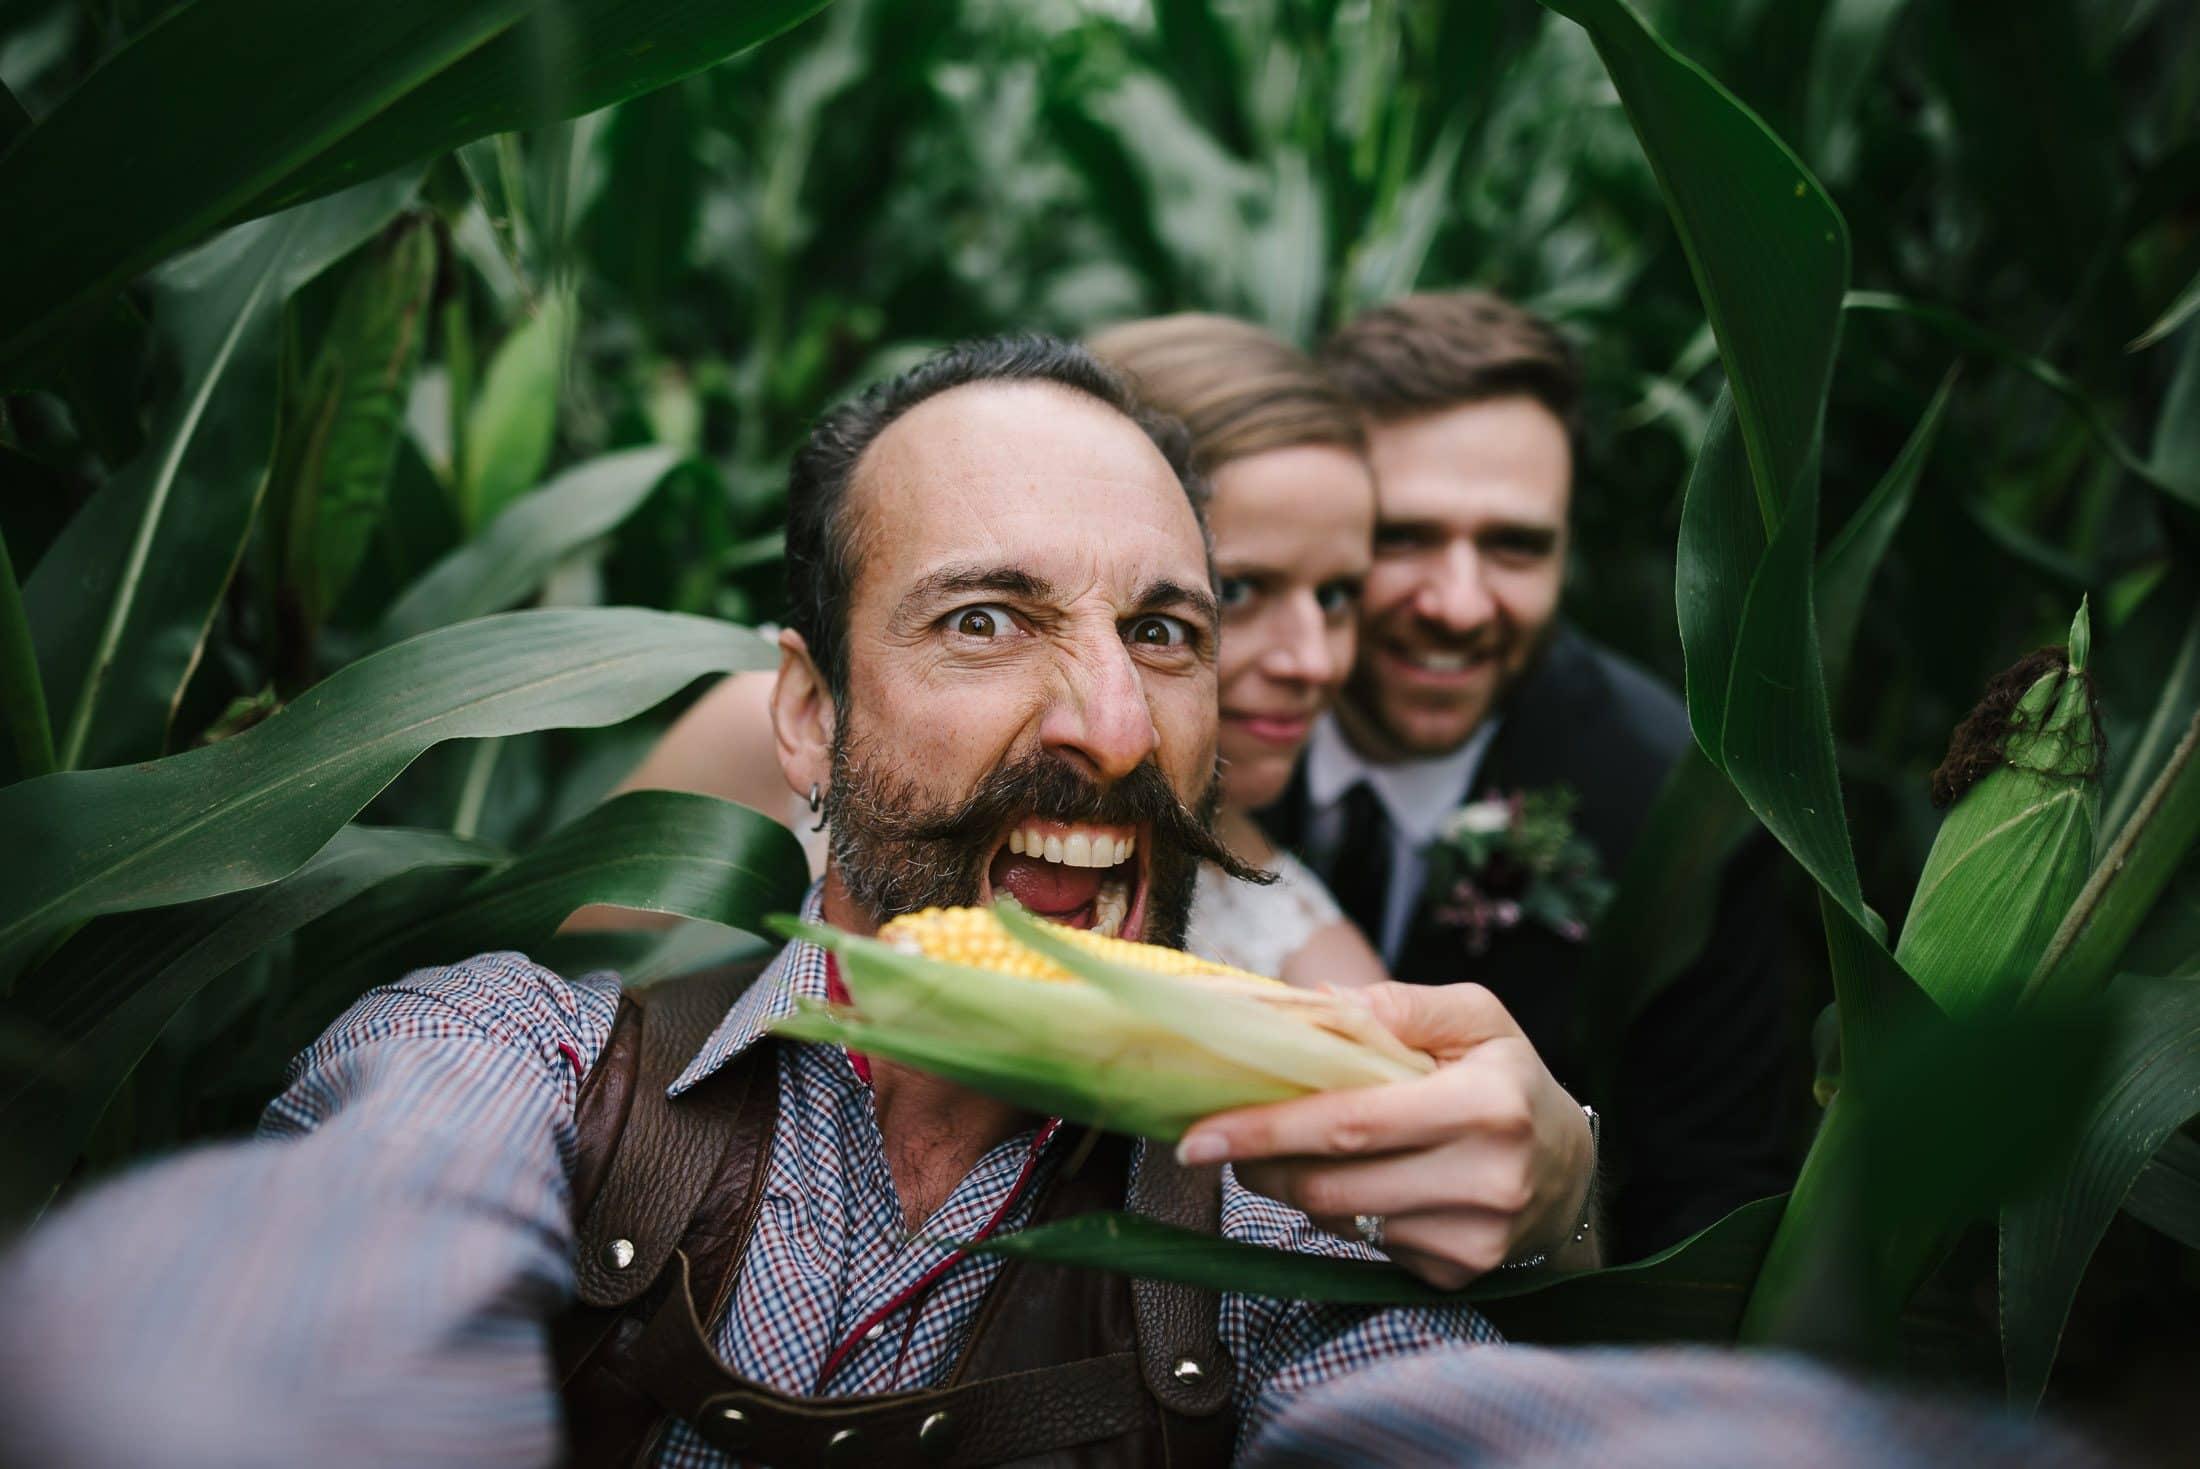 New York Wedding in corn field